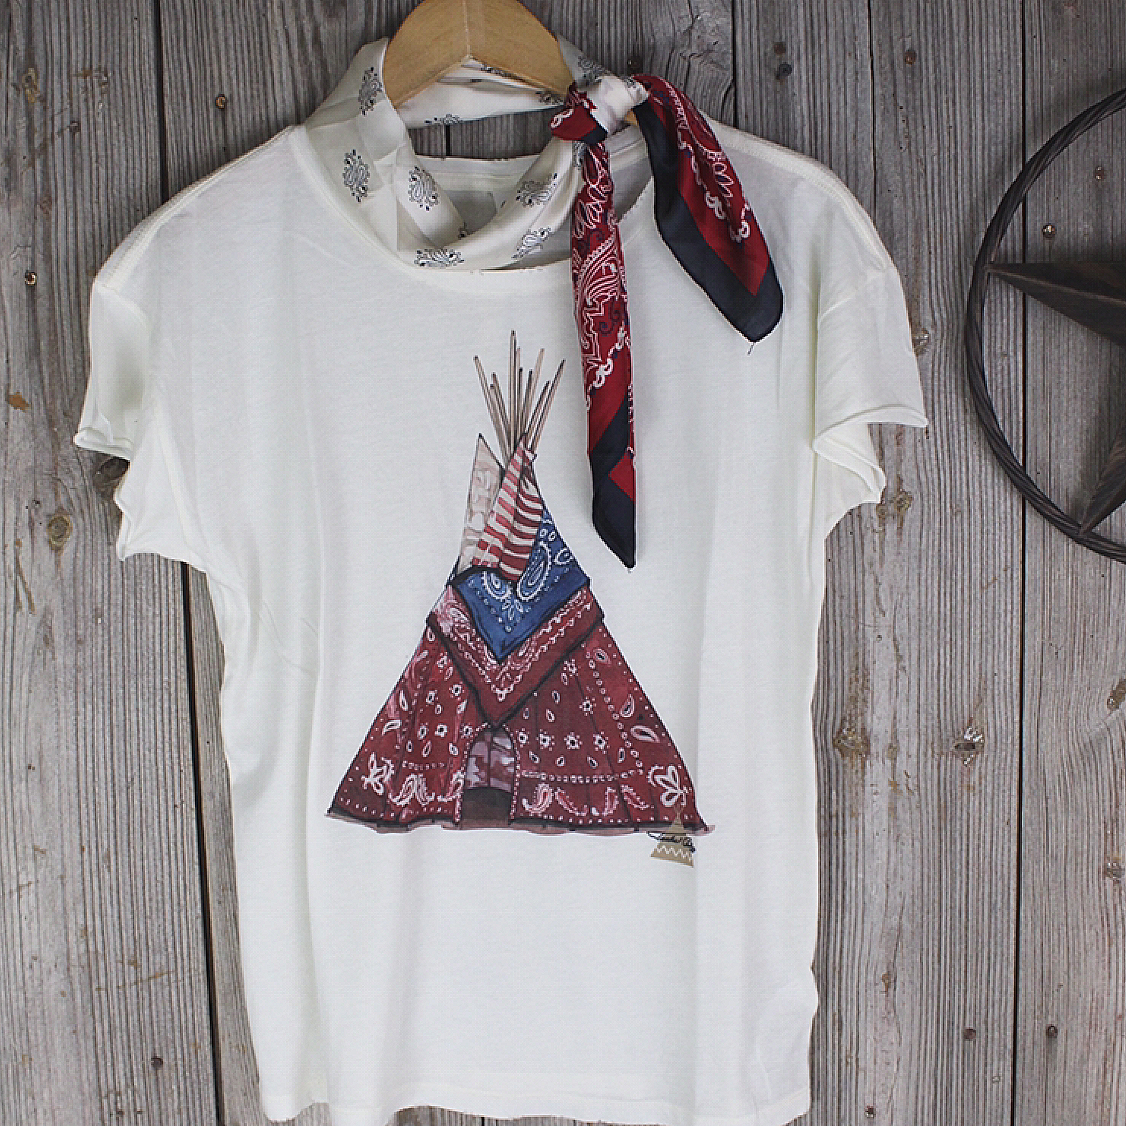 Bandana TeePee T-Shirt from Tasha Polizzi